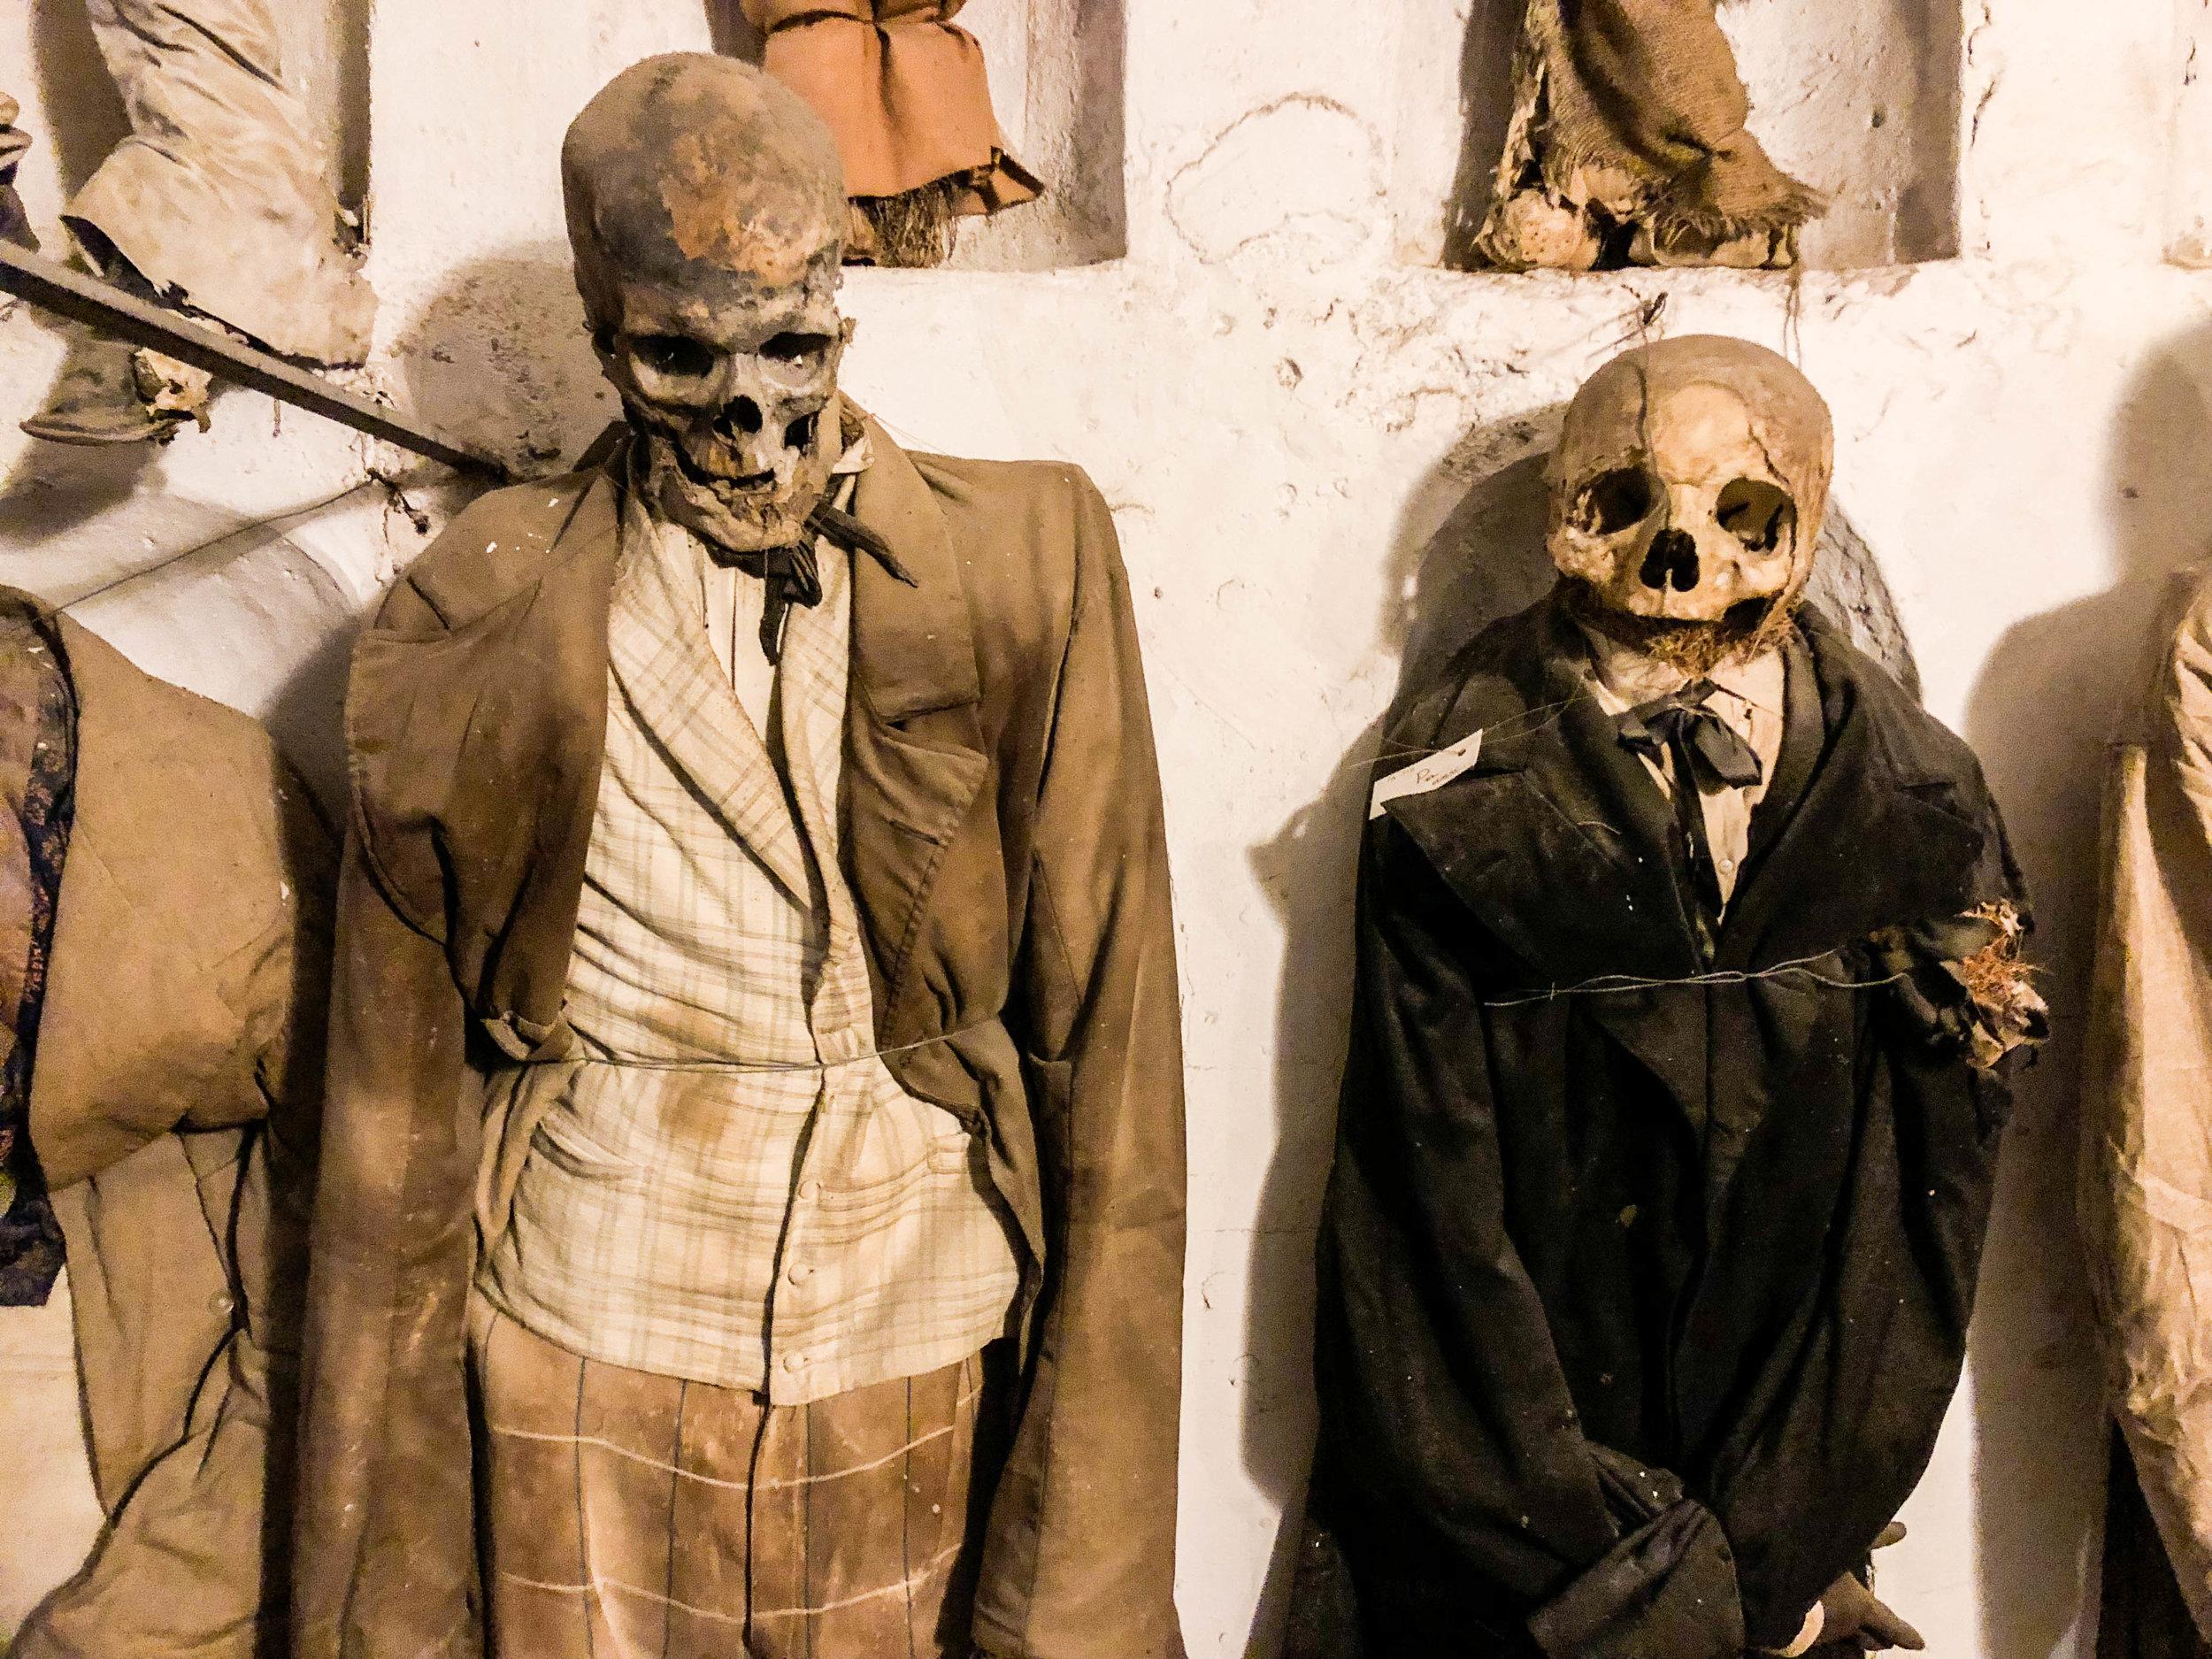 capuchin-catacombs-bodies-palermo-11.jpg